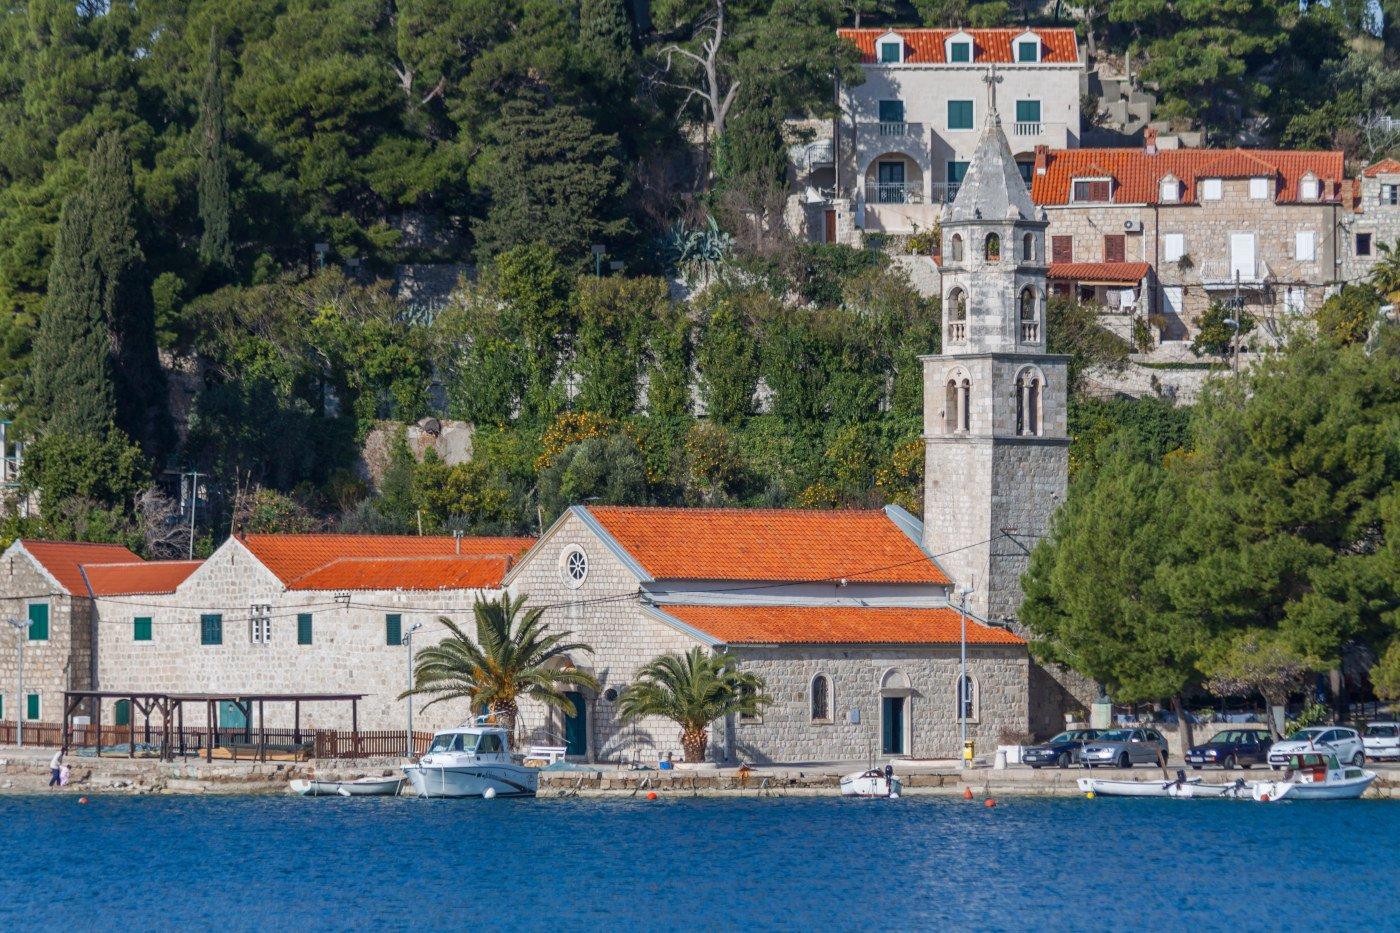 Cavtat Gospa Church on the promenade